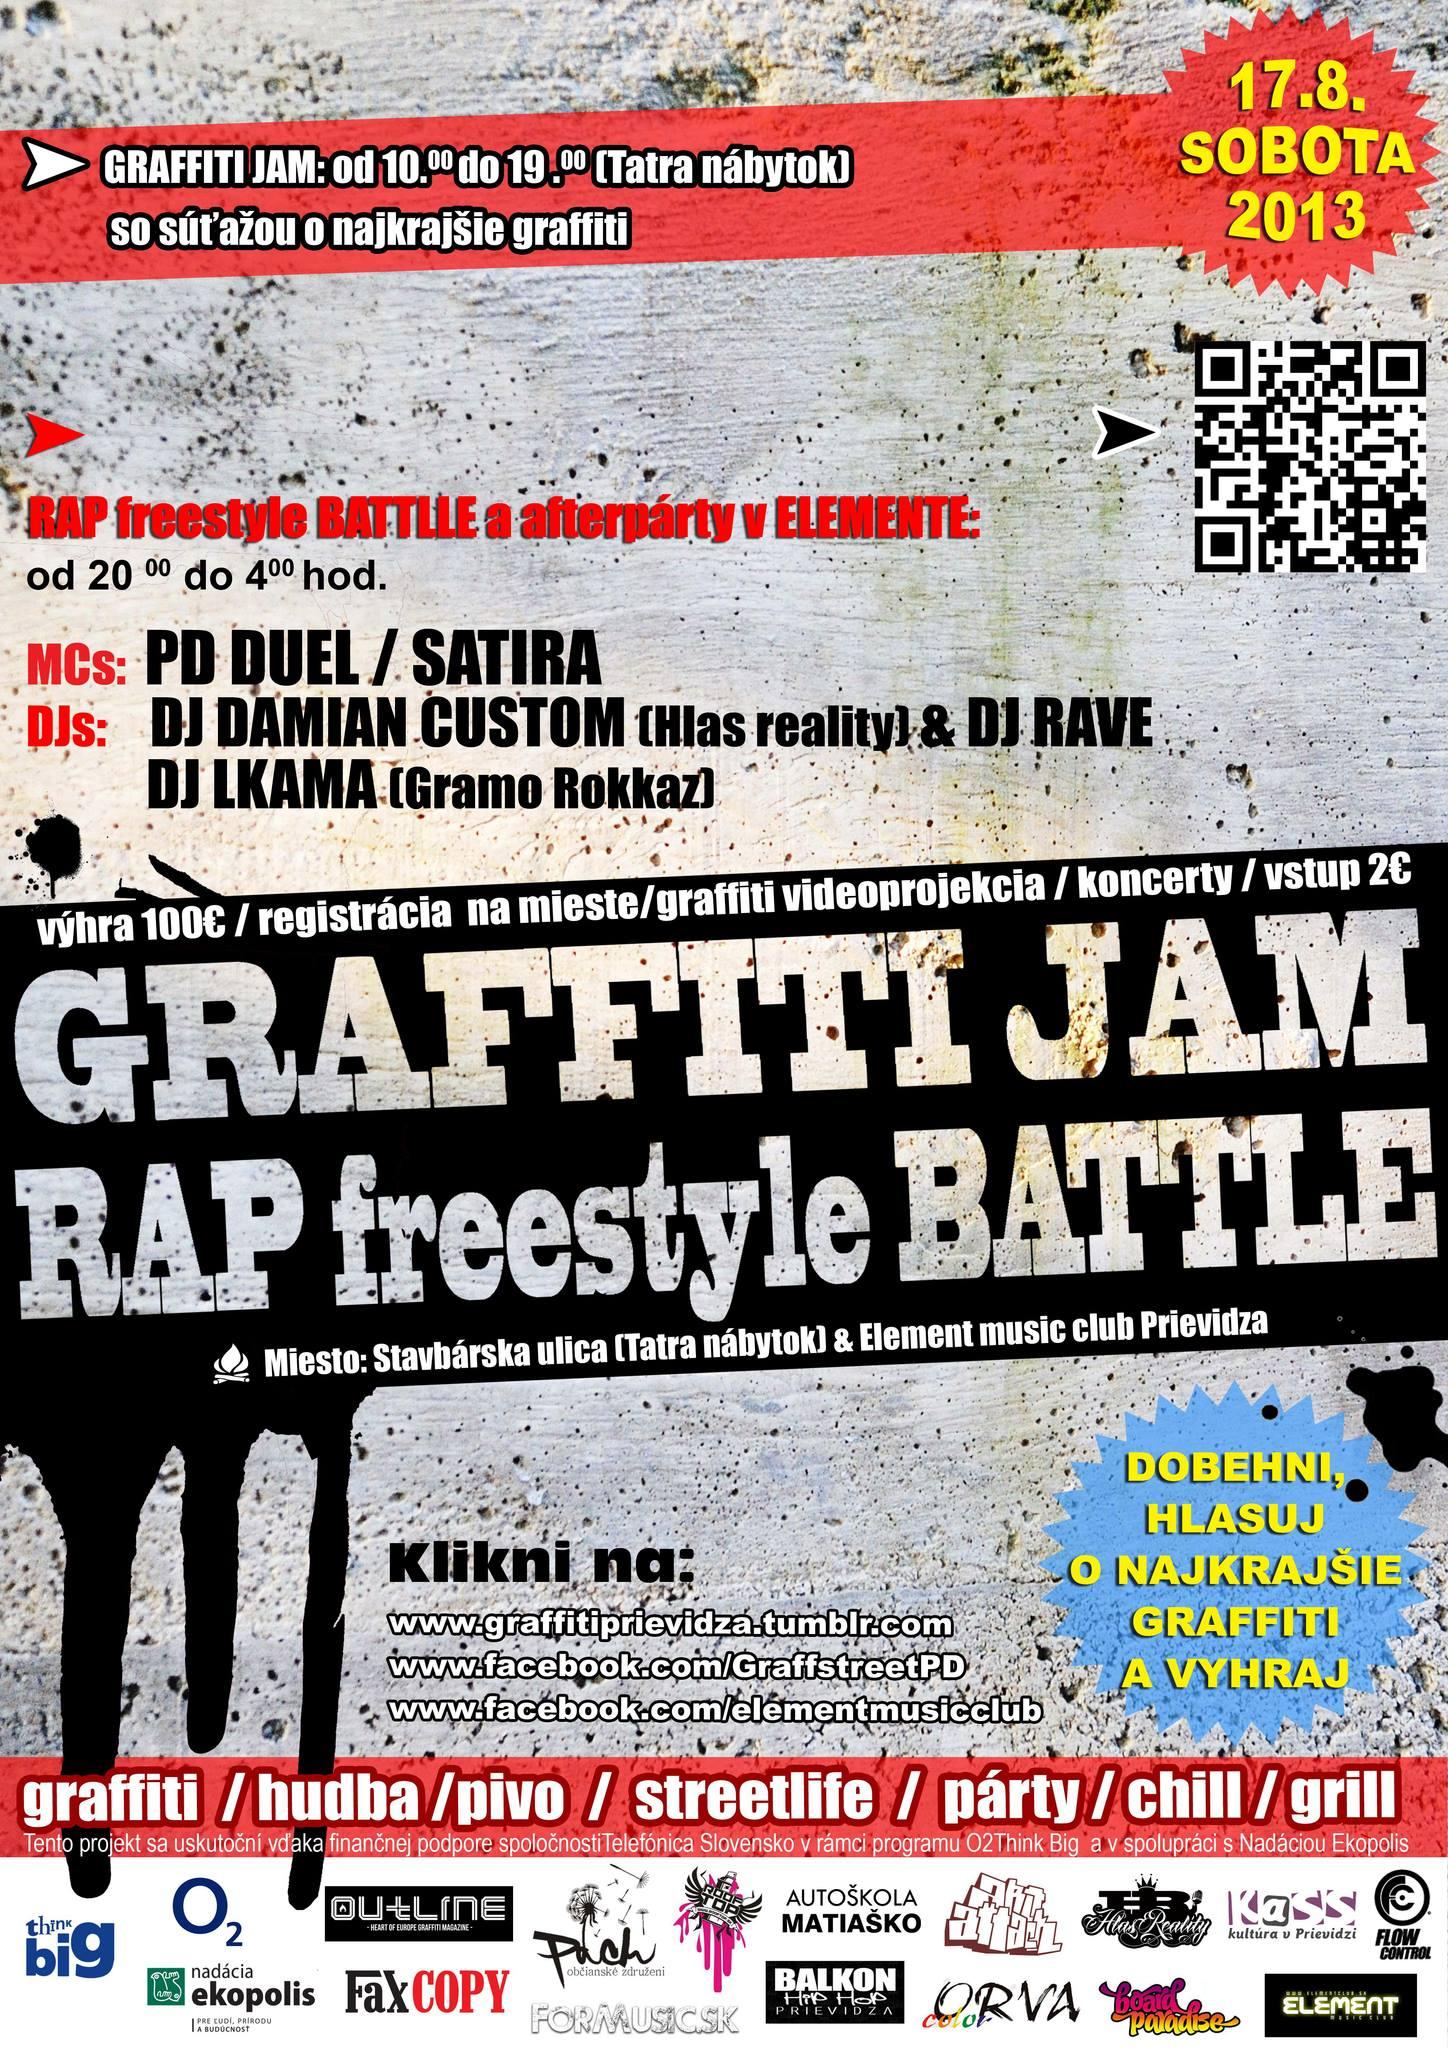 Graffiti jam & Rap freestyle battle